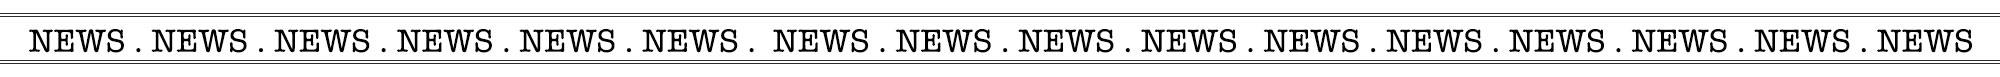 NEWS-border.jpg